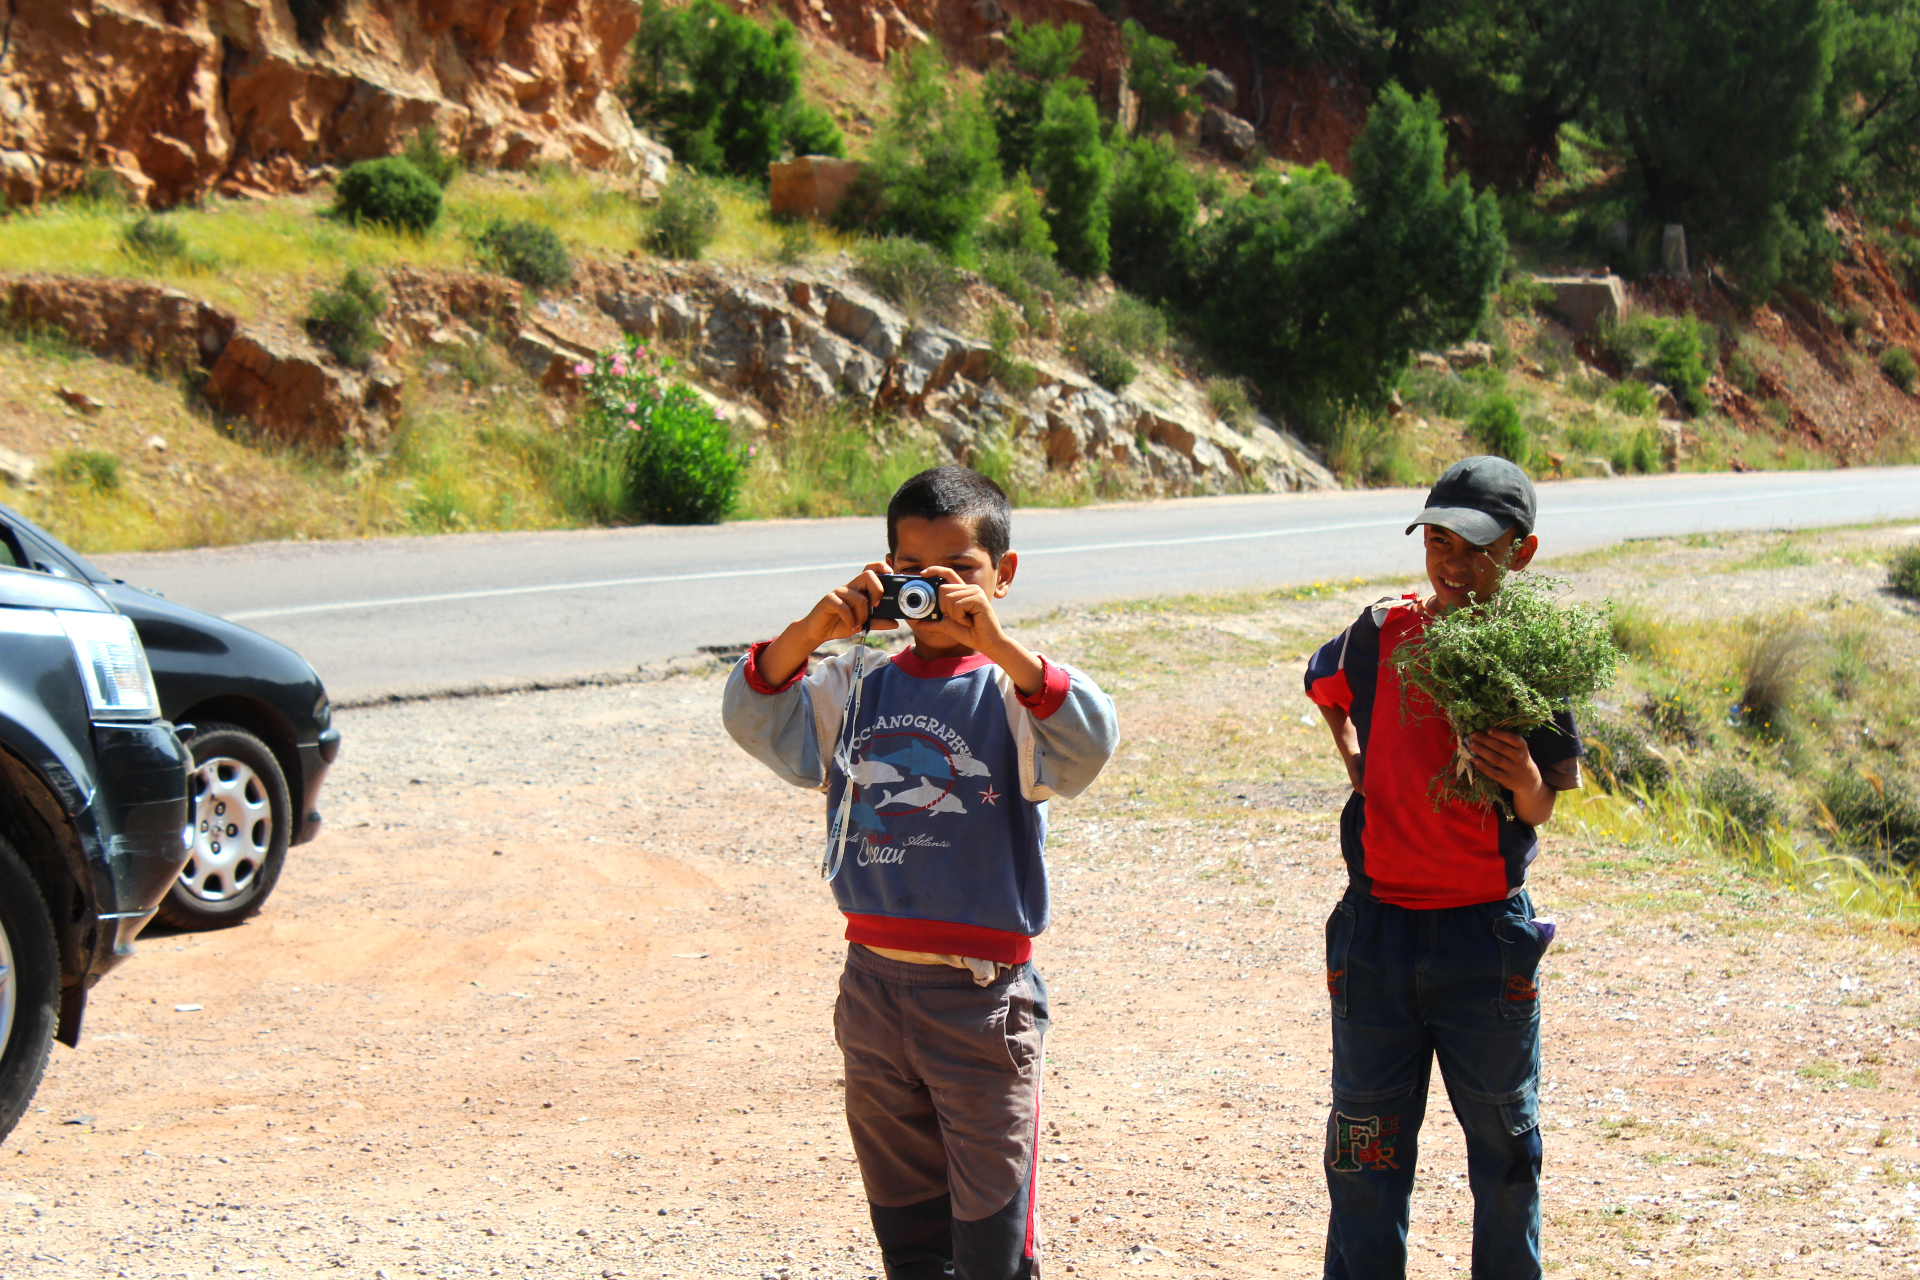 Tilouguit Berber children